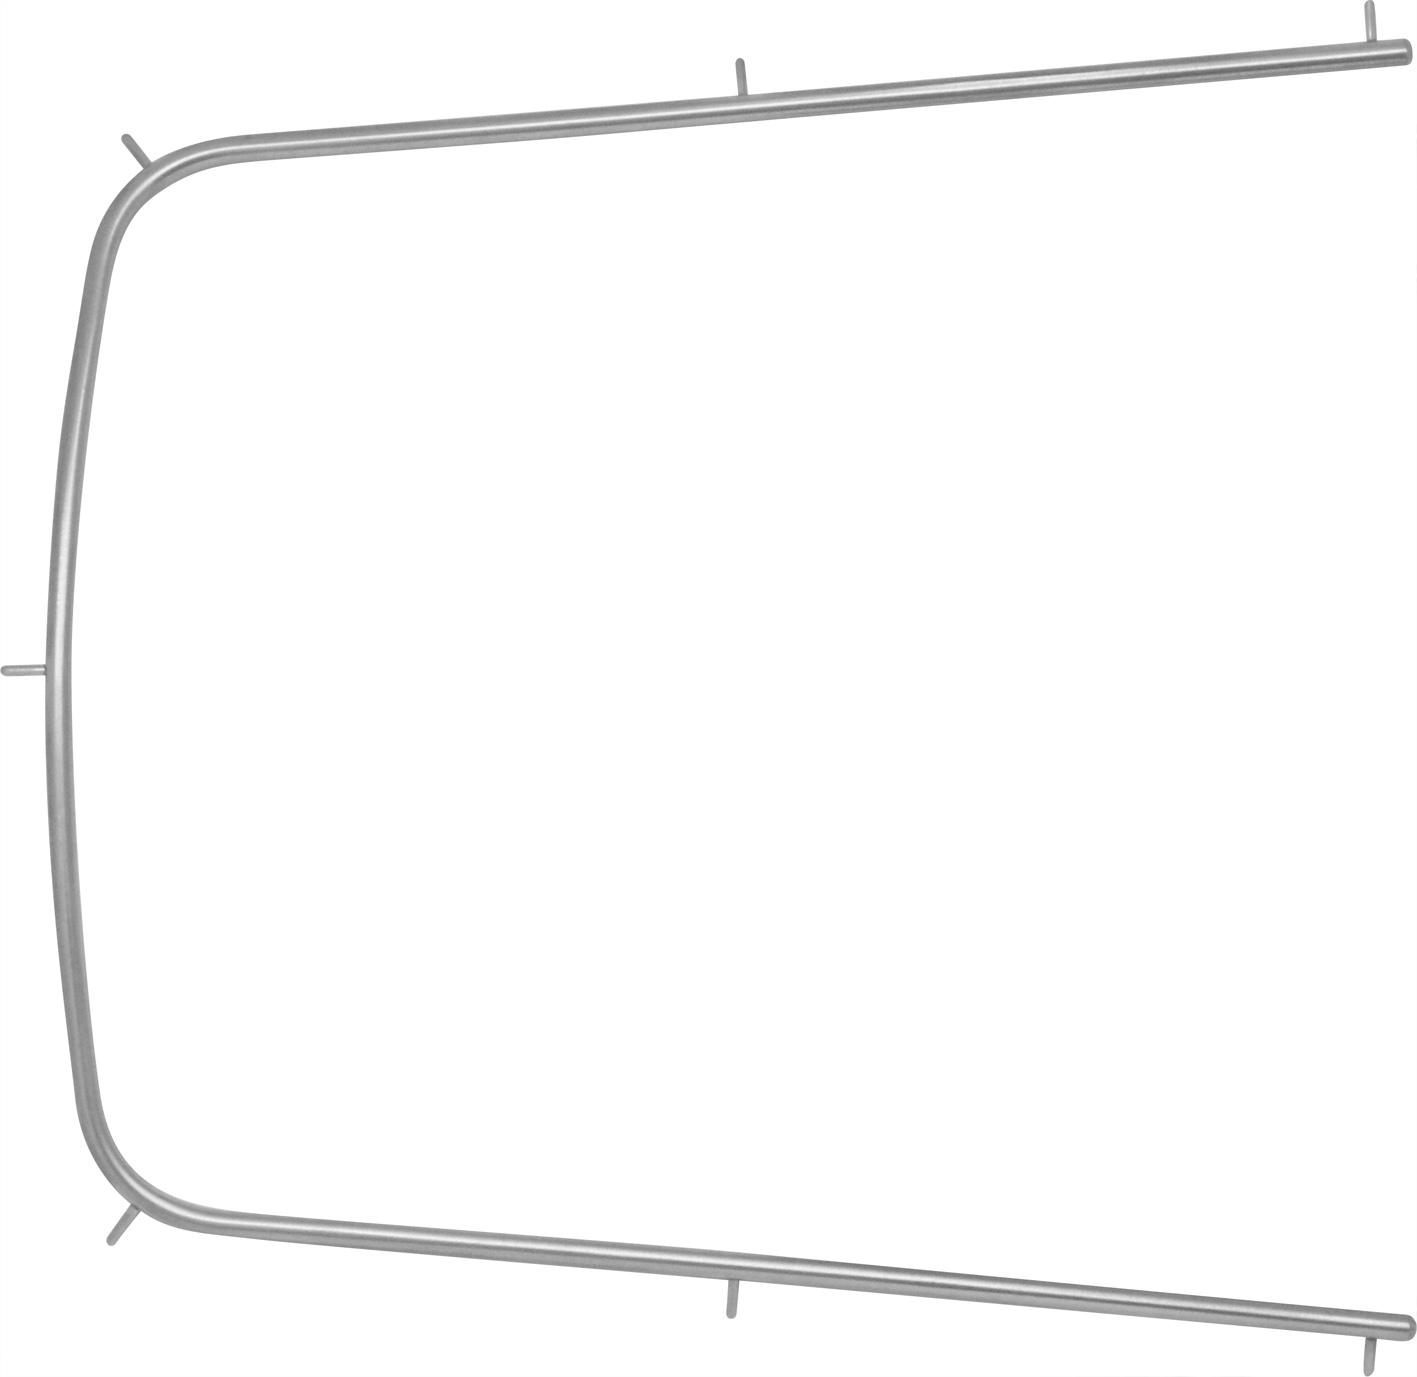 Kofferdam-Rahmen   100 x 121 mm